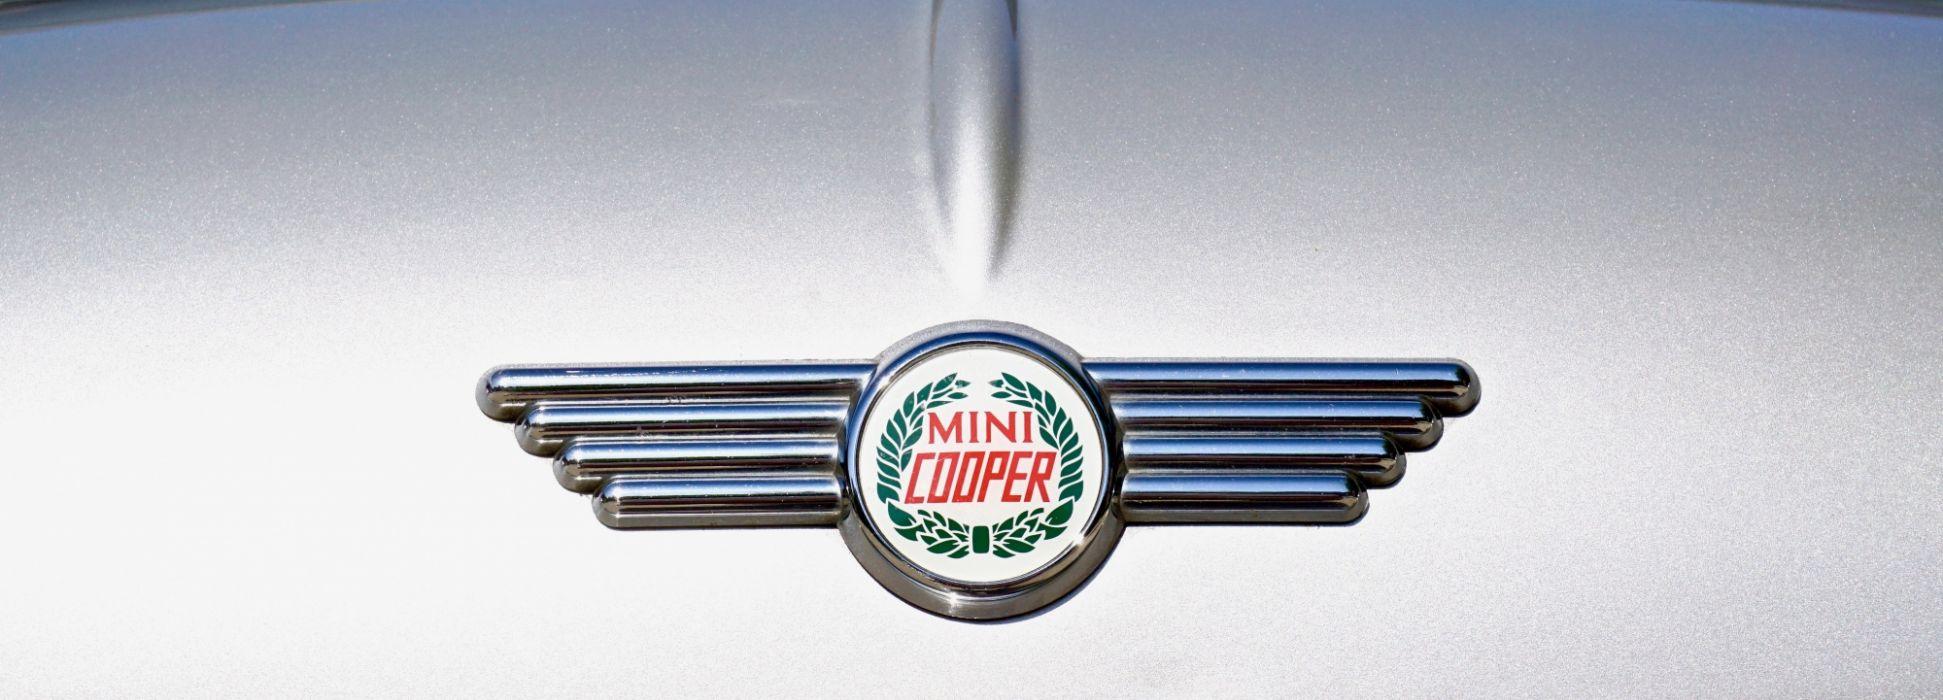 MINI Cooper MkII 8